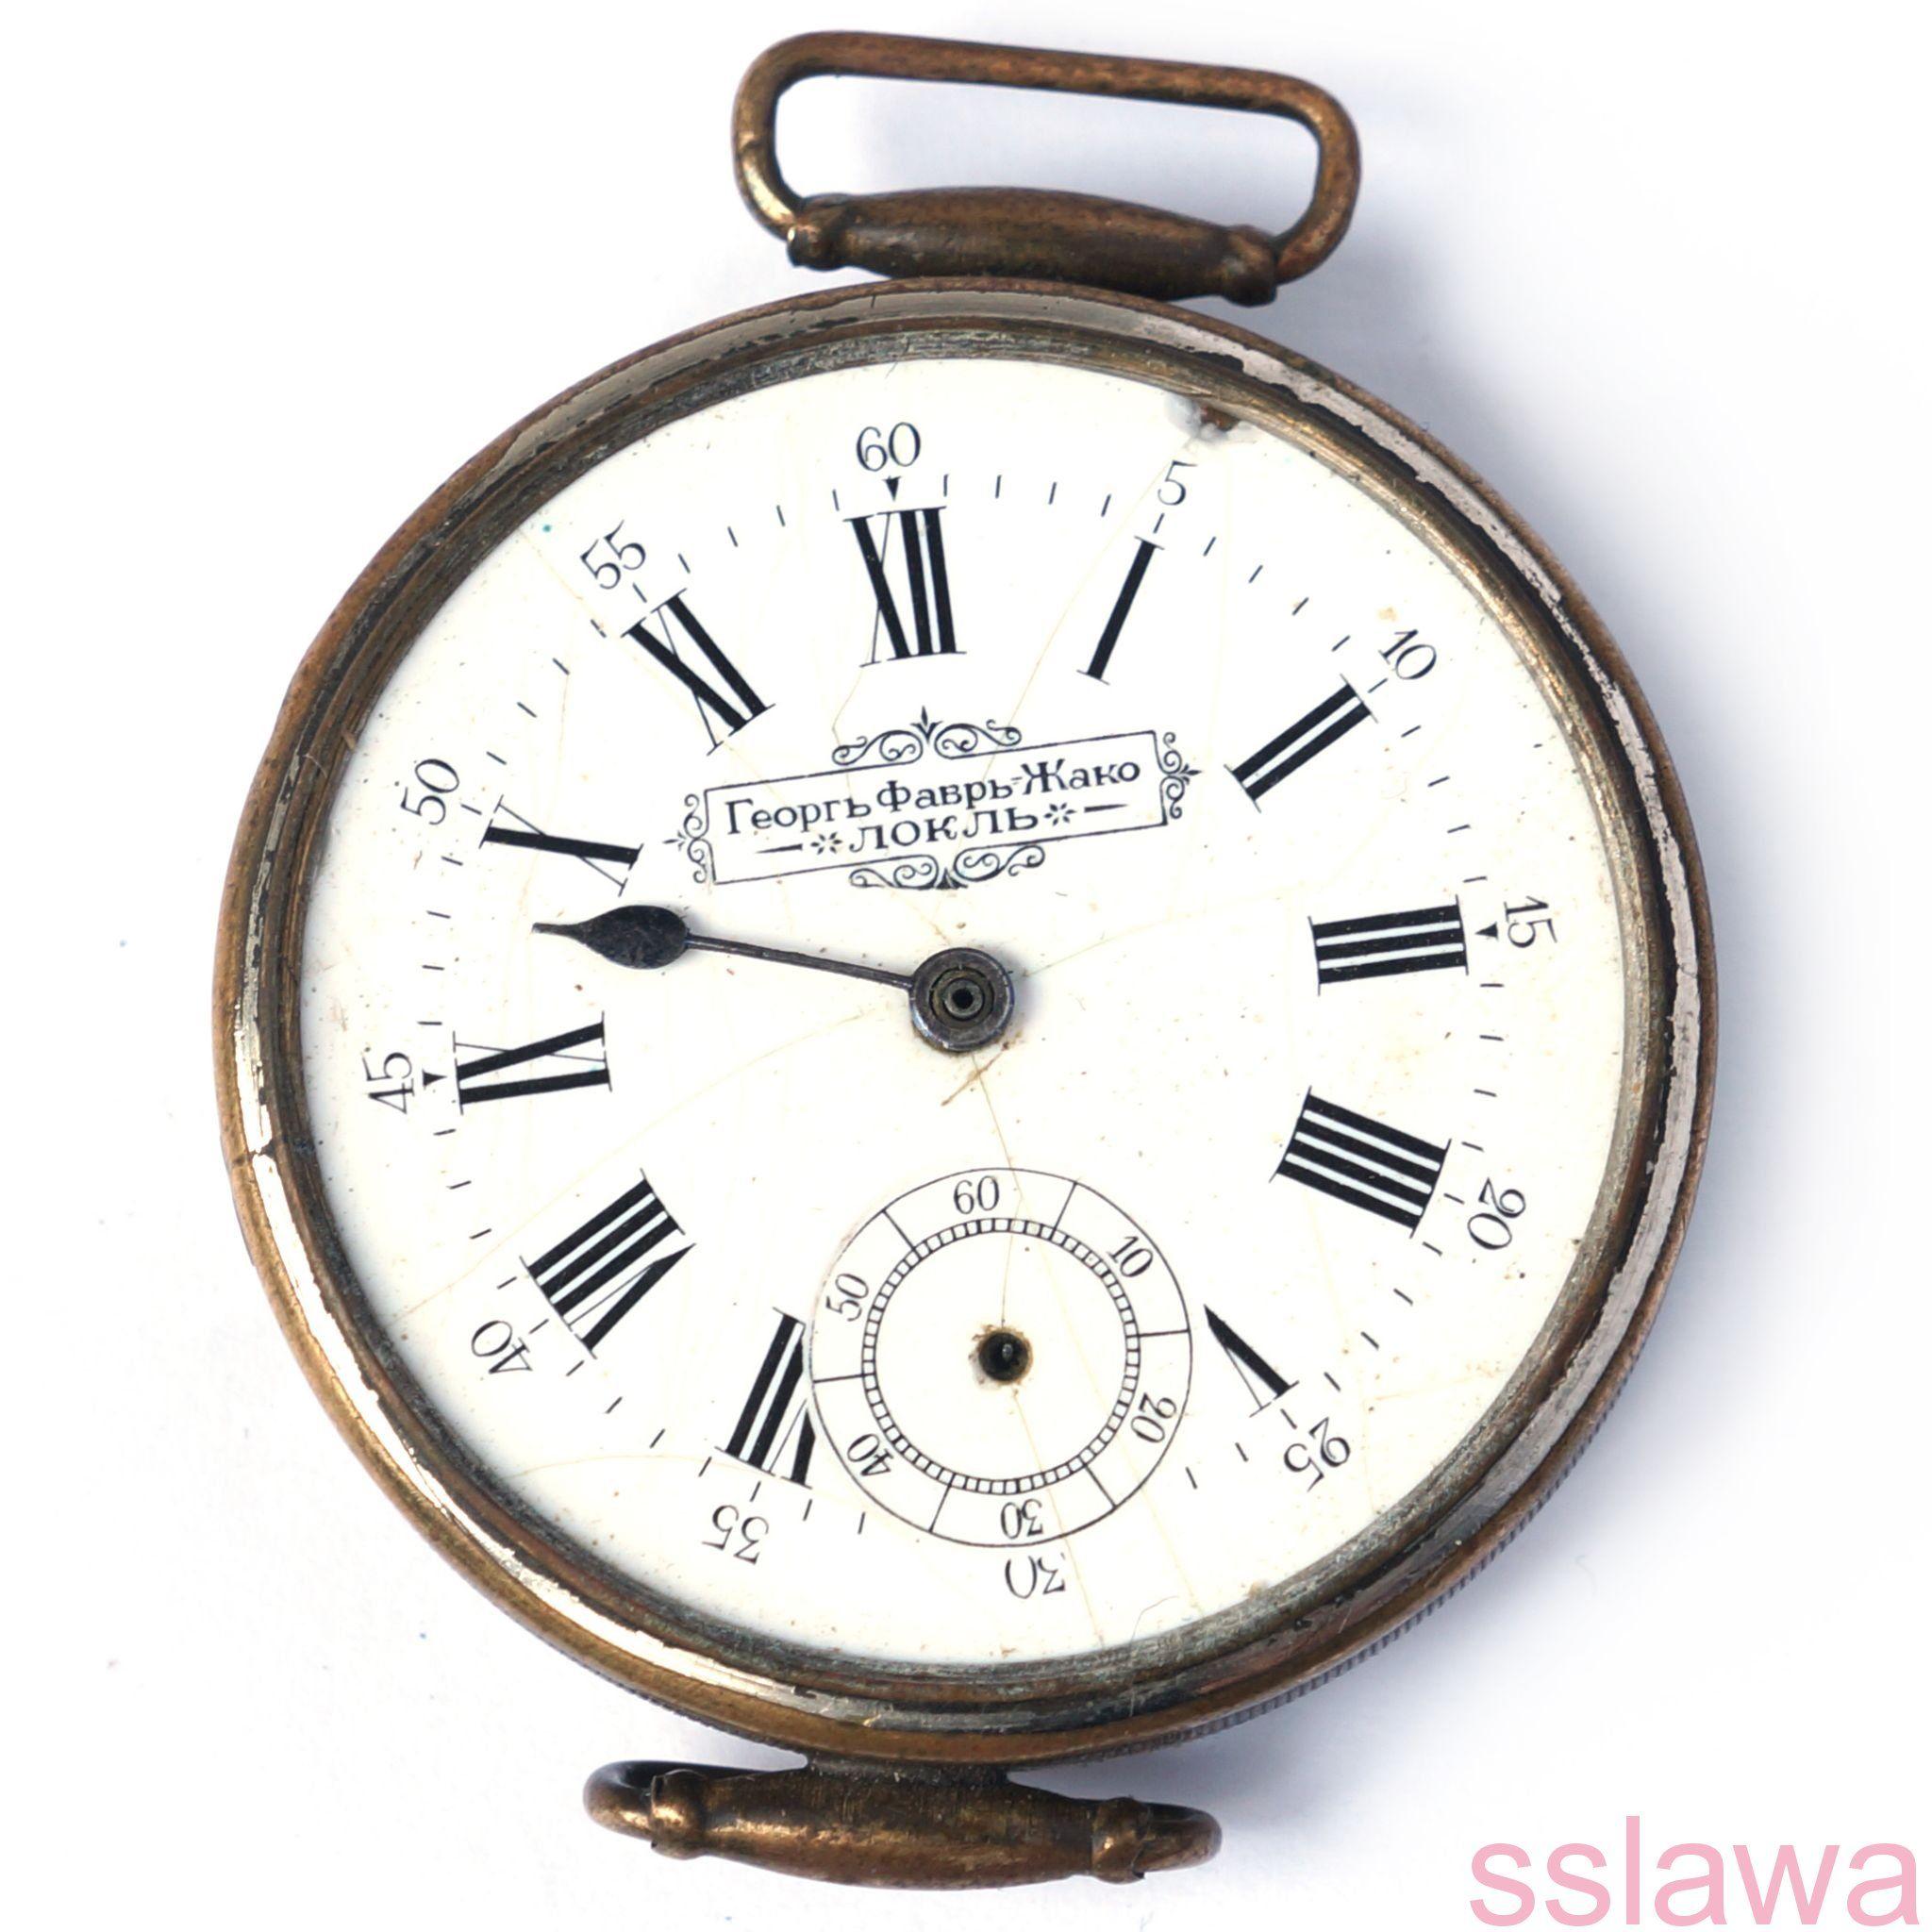 1e83a8e6 Часы карманные часы Георг Фавр Жако ЛОКЛЬ ЗАПЧАСТИ vintage pocket watch  #ГеоргФаврЖако #ФаврЖако #